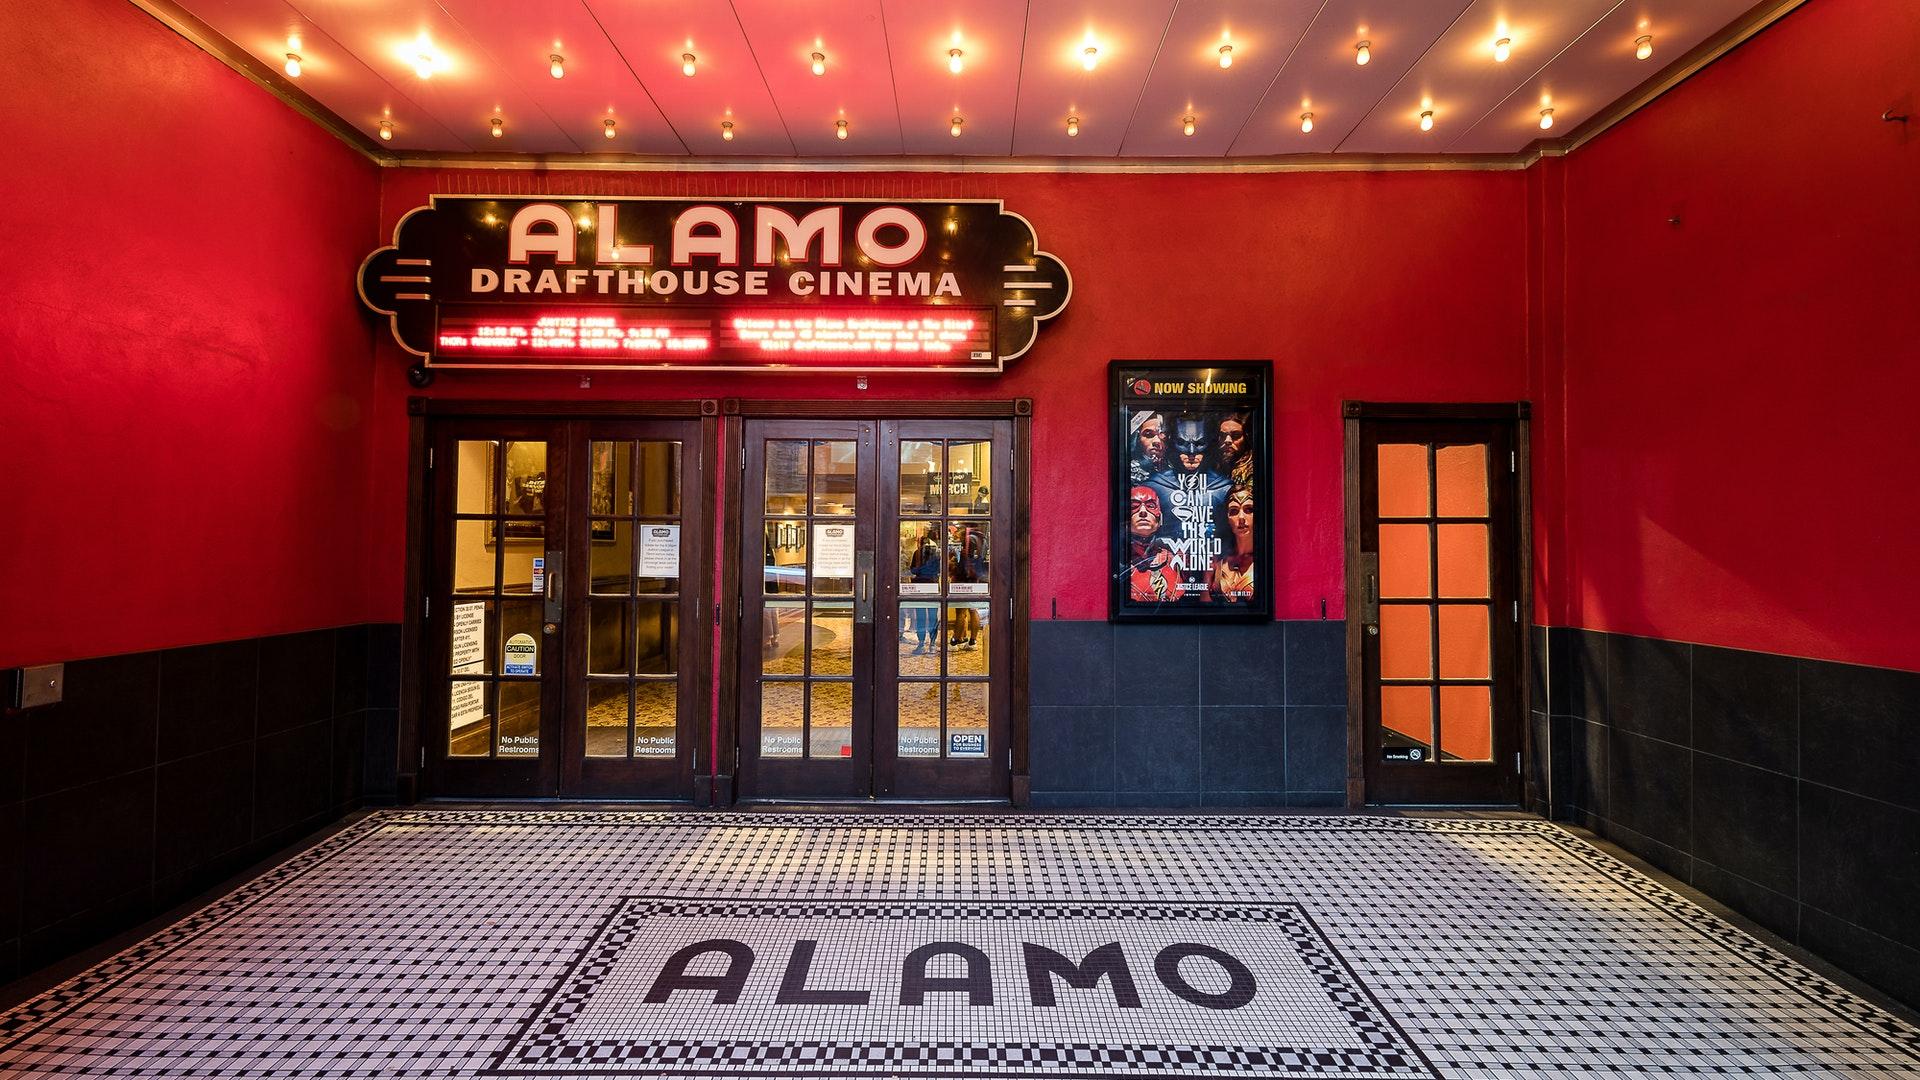 Alamo Drafthouse's Ritz location in Austin, TX